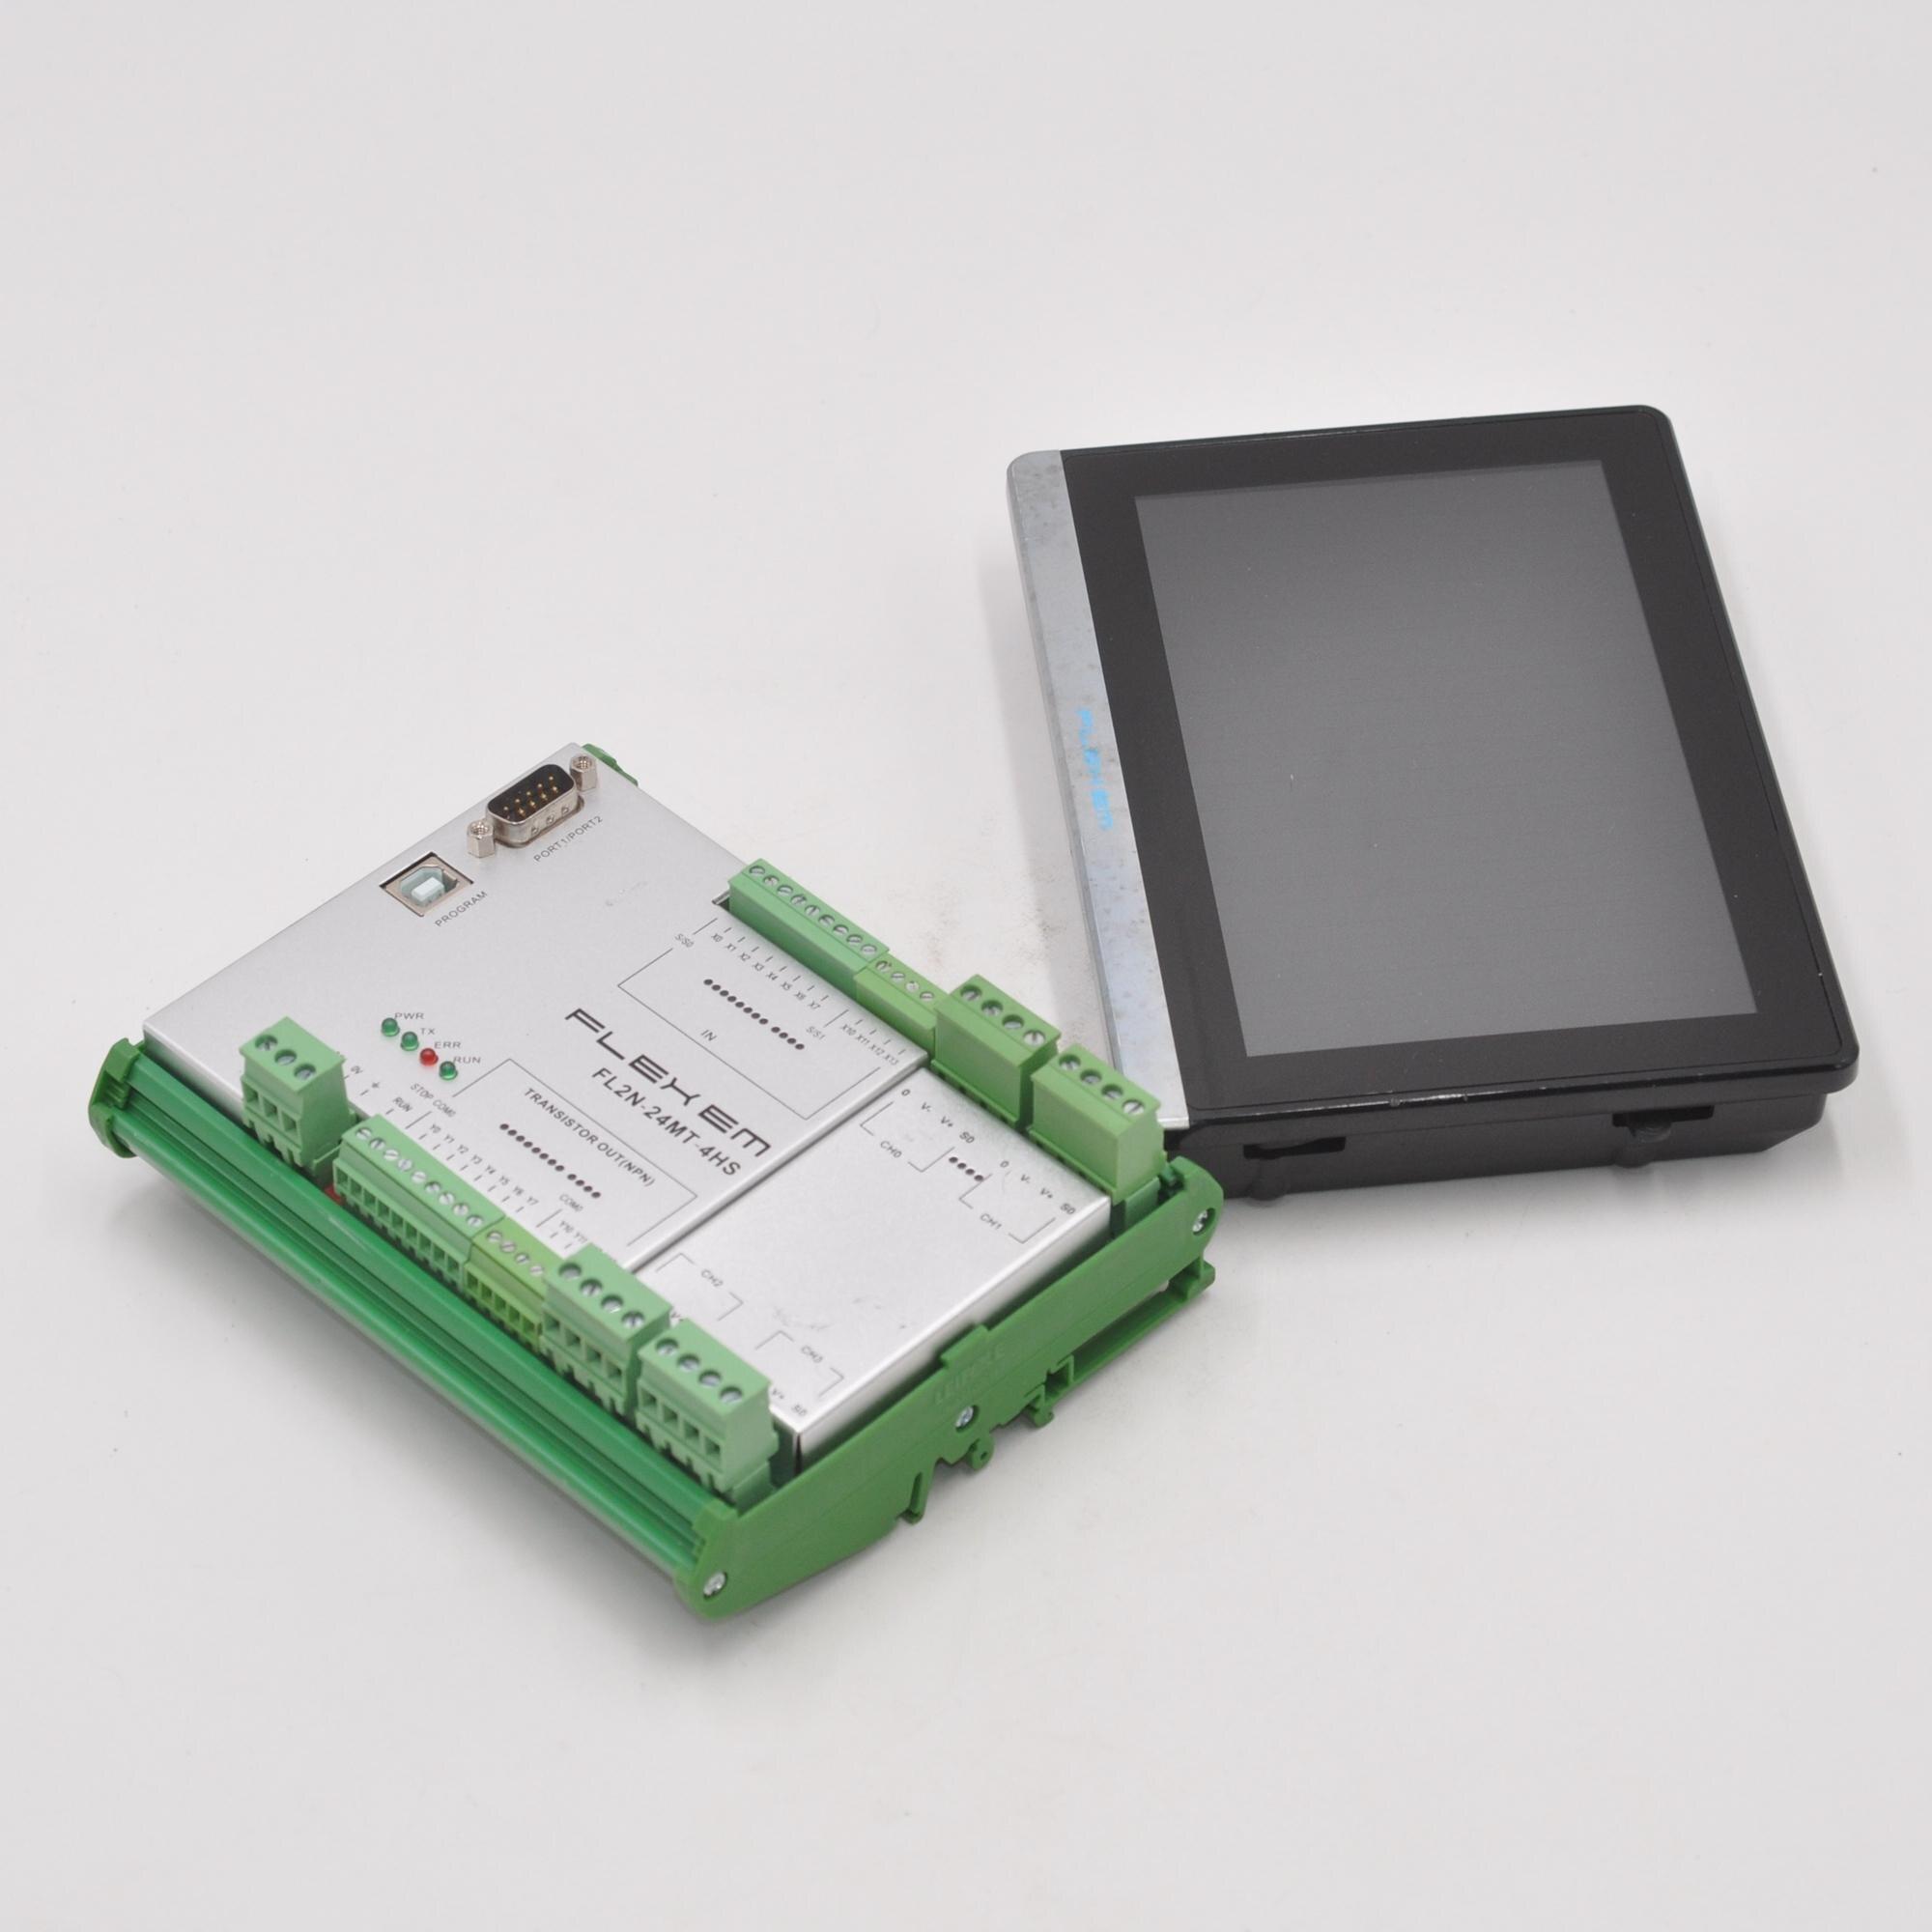 FLEHEM module FL2N-24MT-4HS display F007 set for sale function is normal enlarge